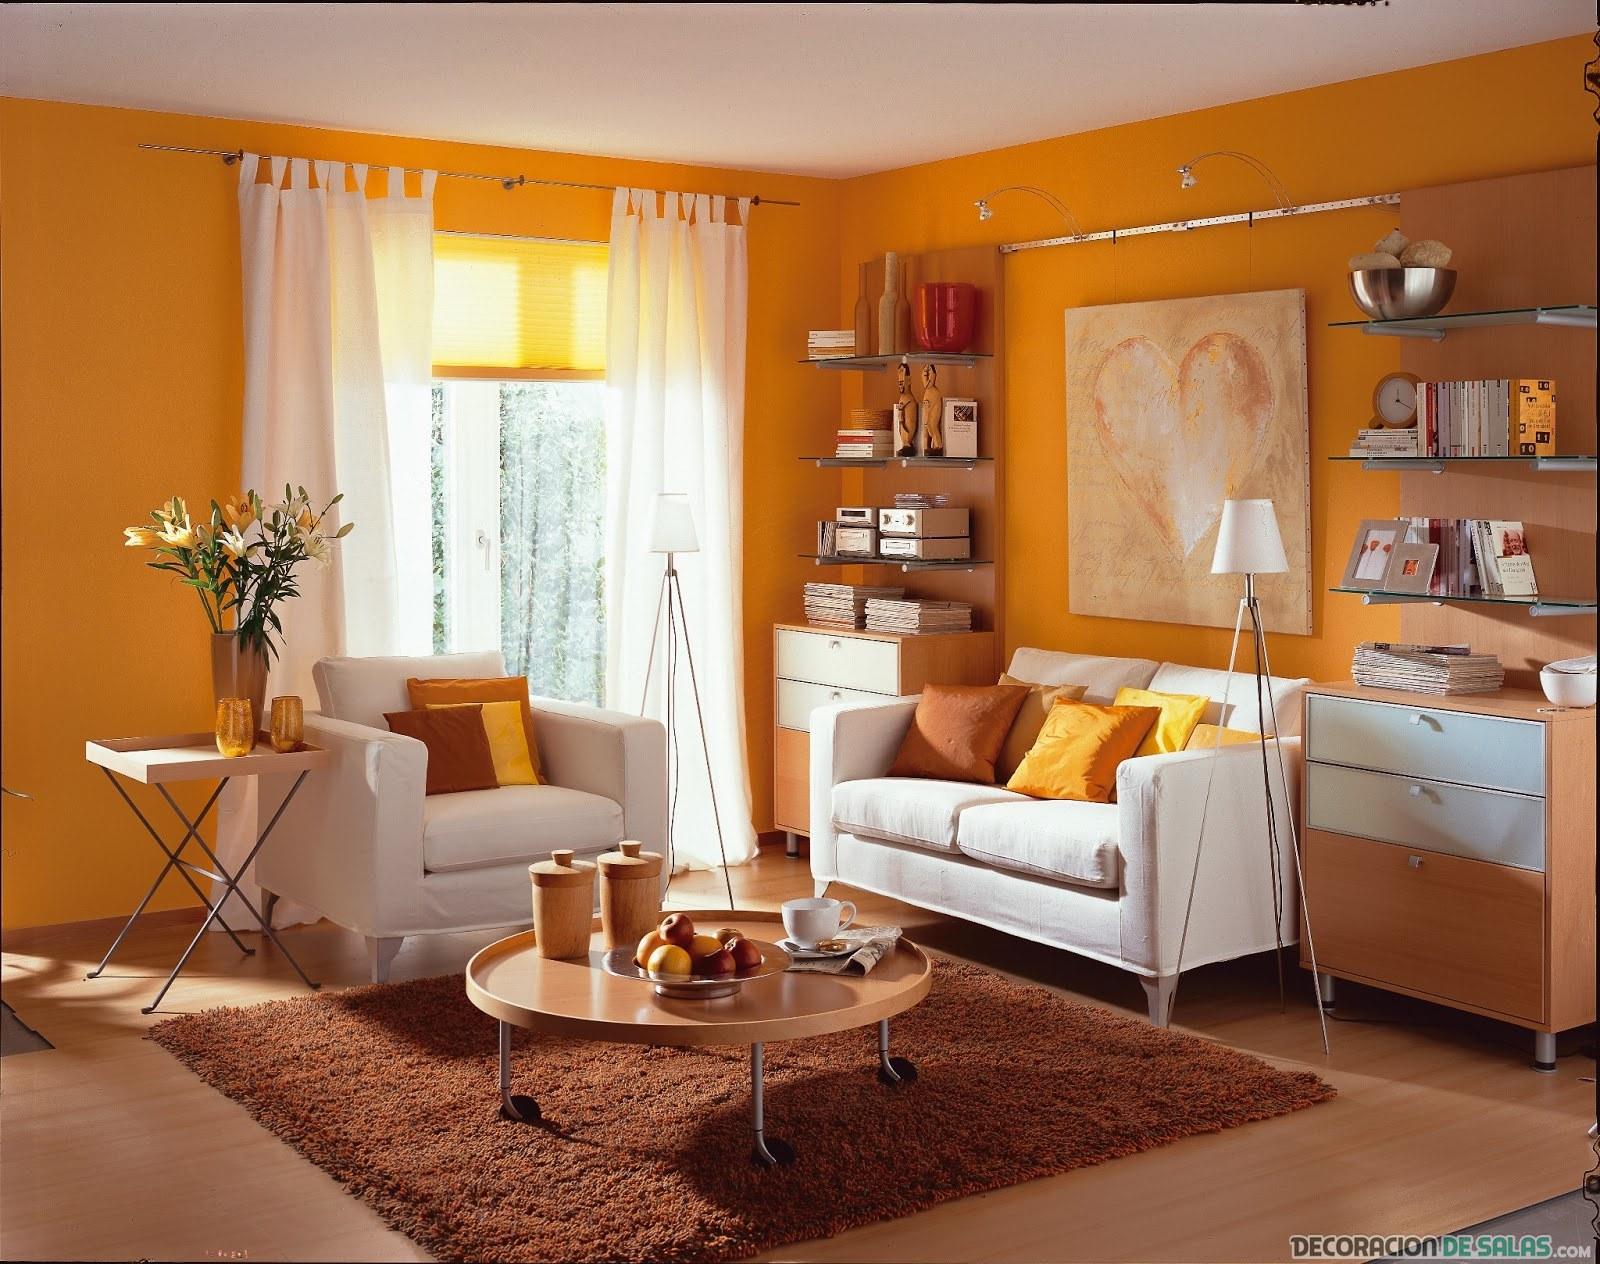 Las salas m s vistosas le dan la bienvenida al naranja - Pared naranja combina con ...